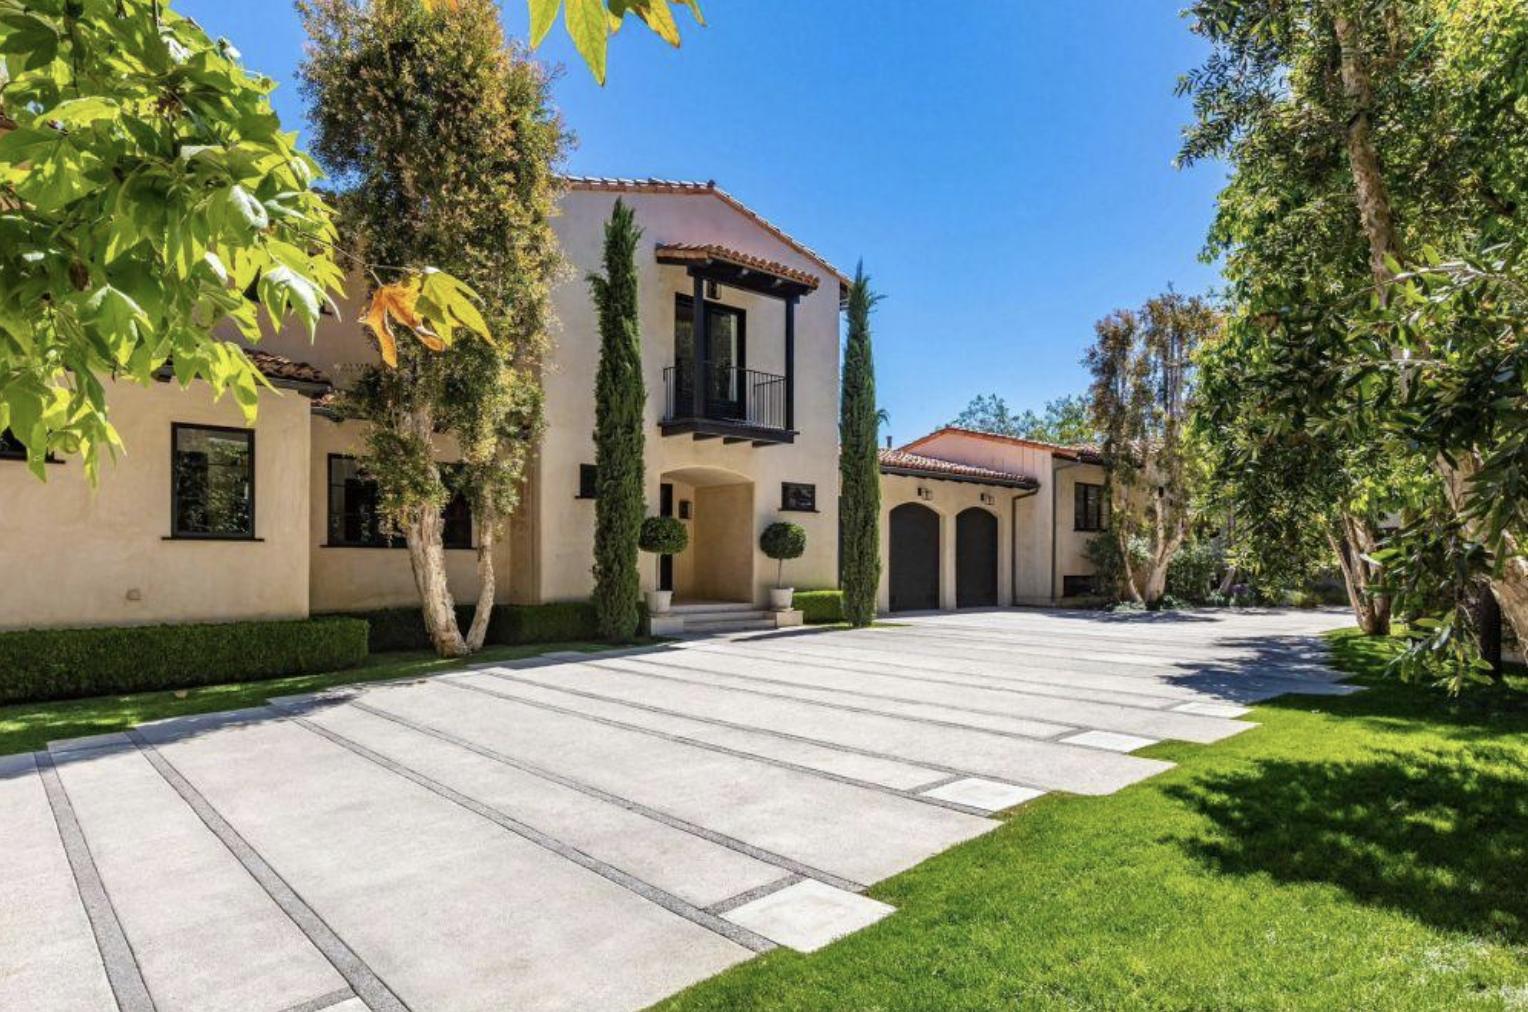 villa van Justin Timberlake